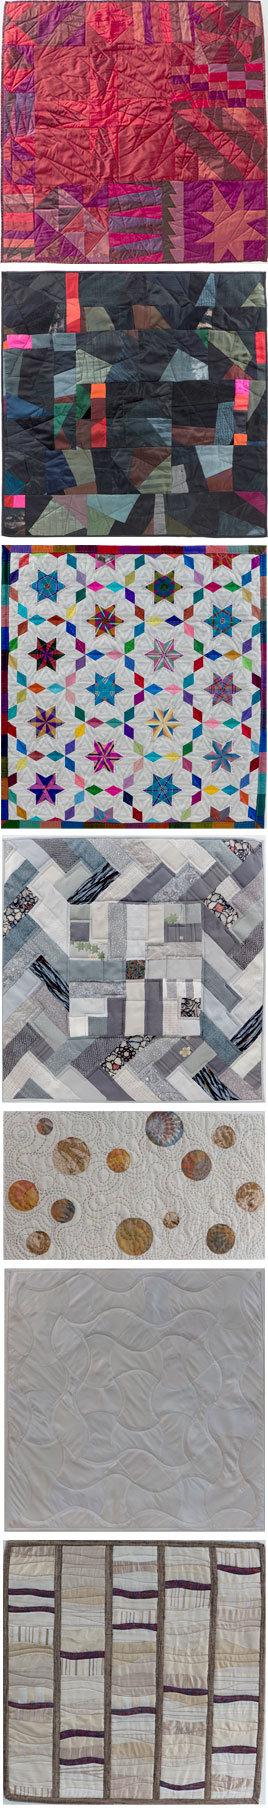 Jill Sharpe - Textiles